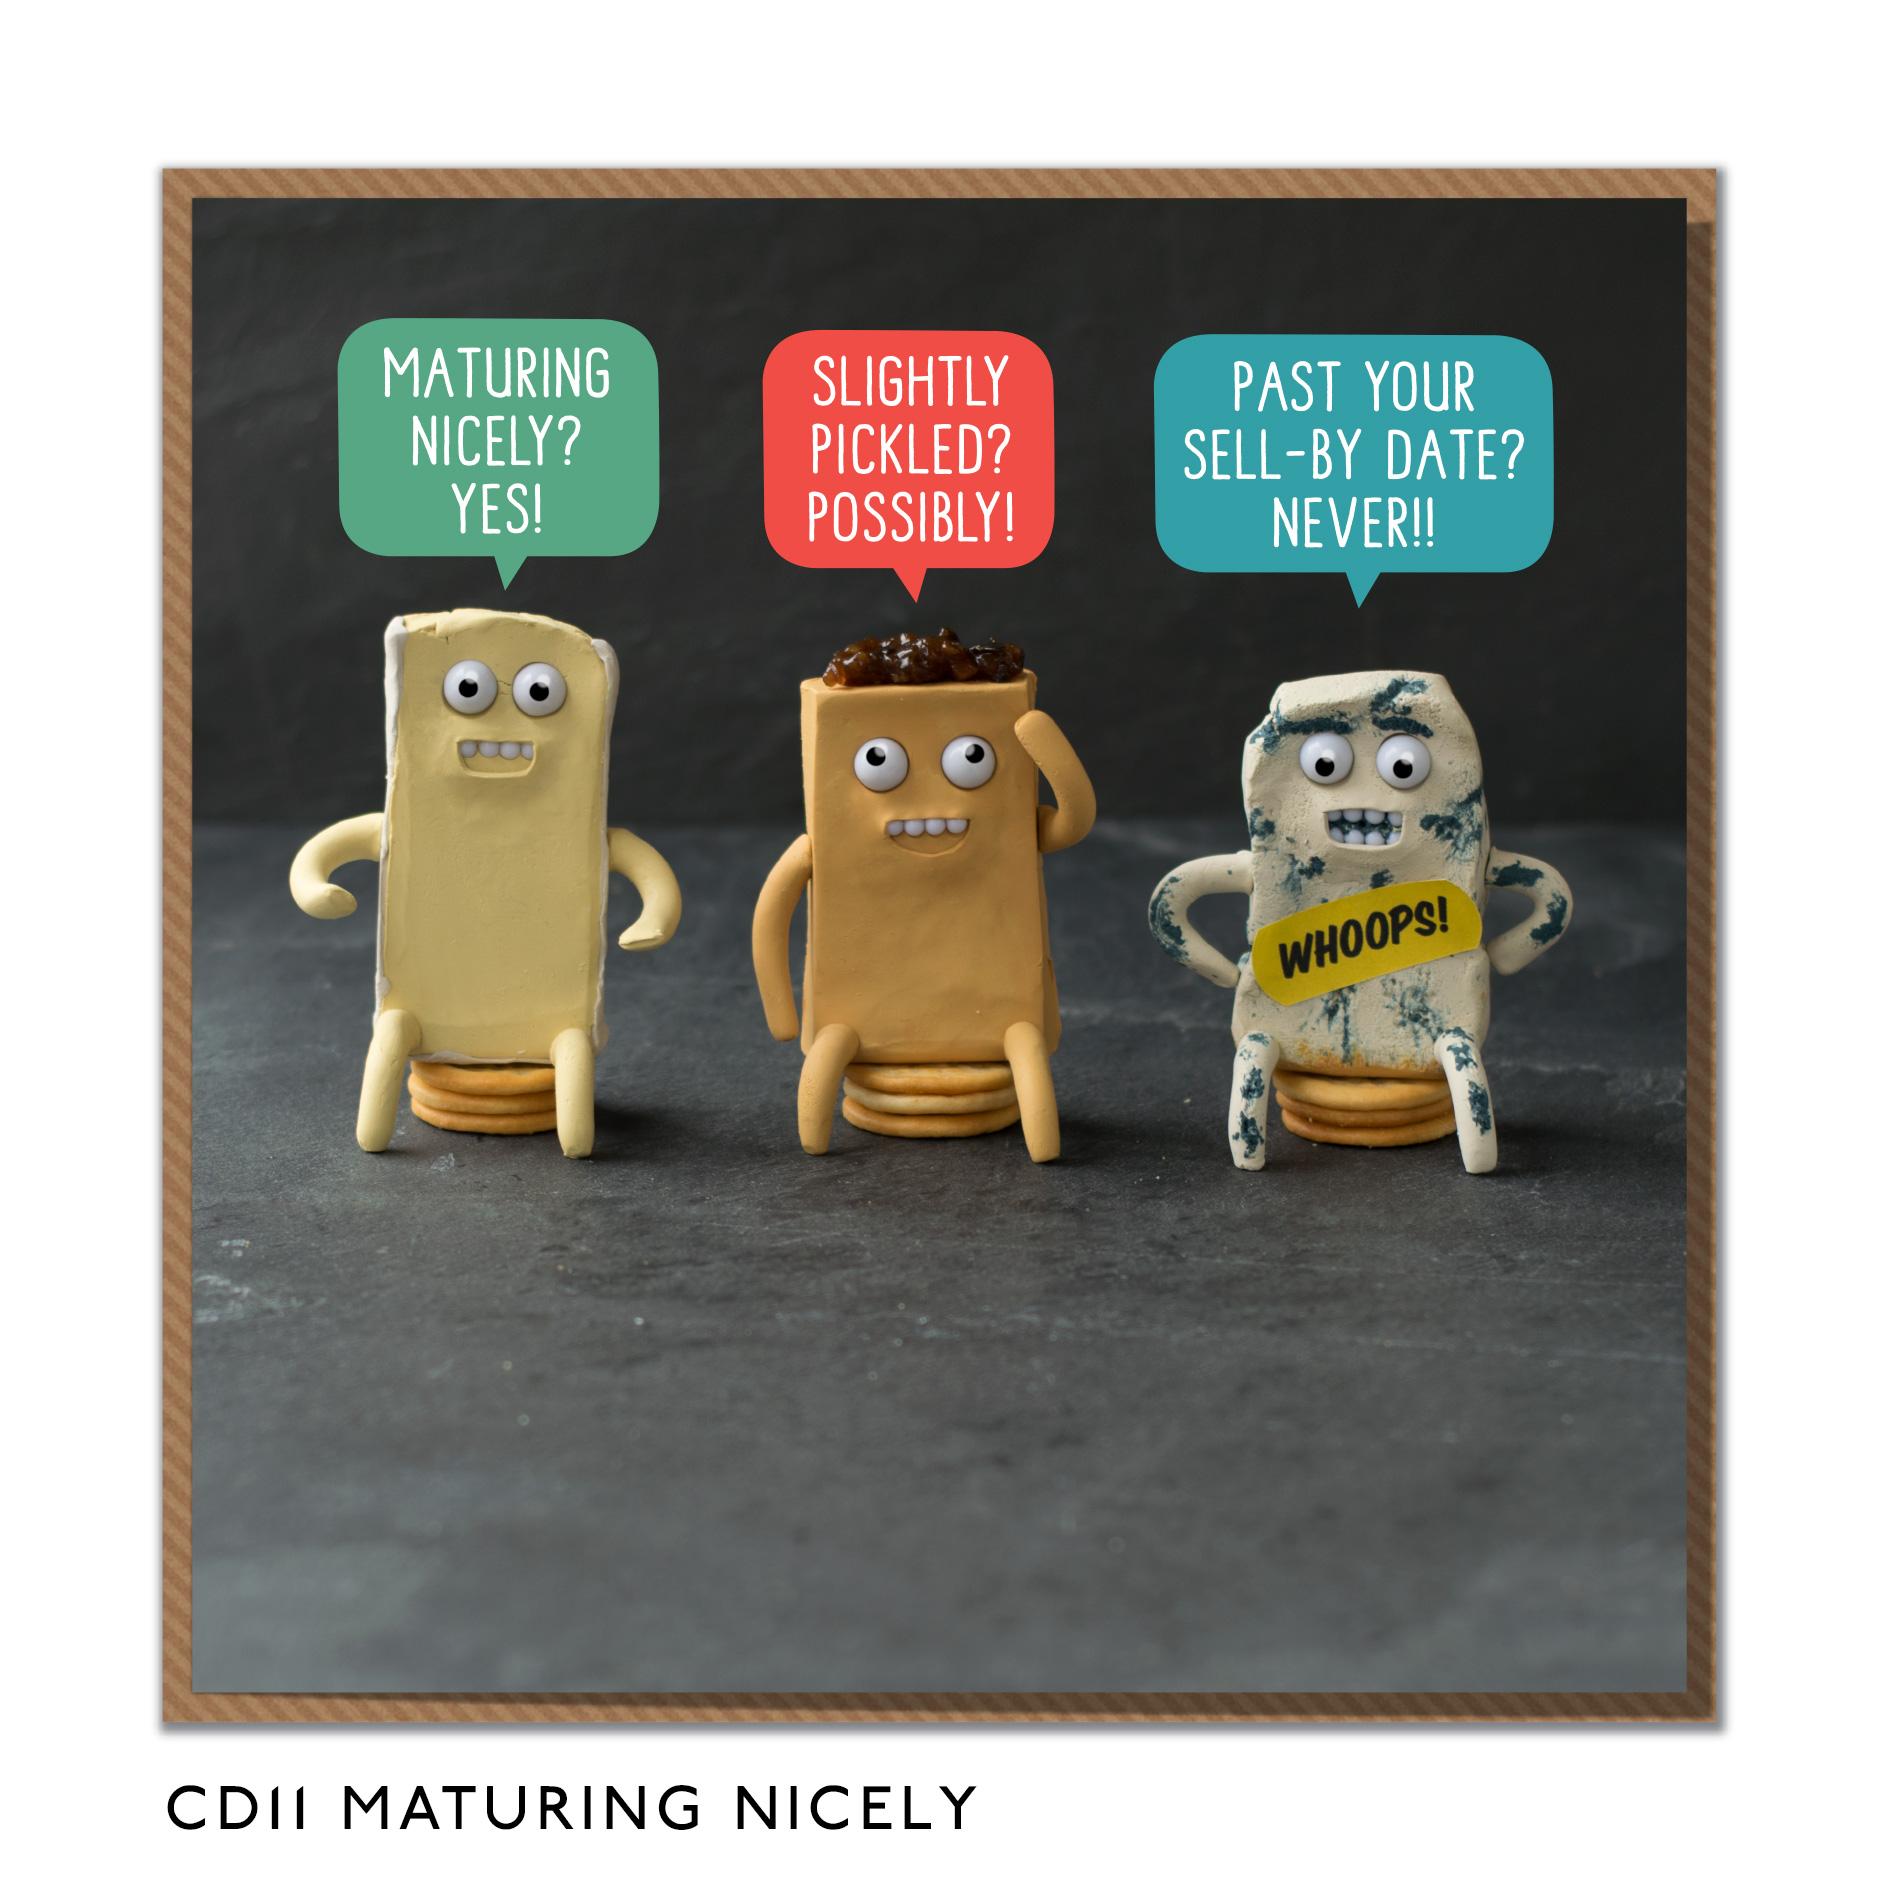 CD11-MATURING-NICELY.jpg